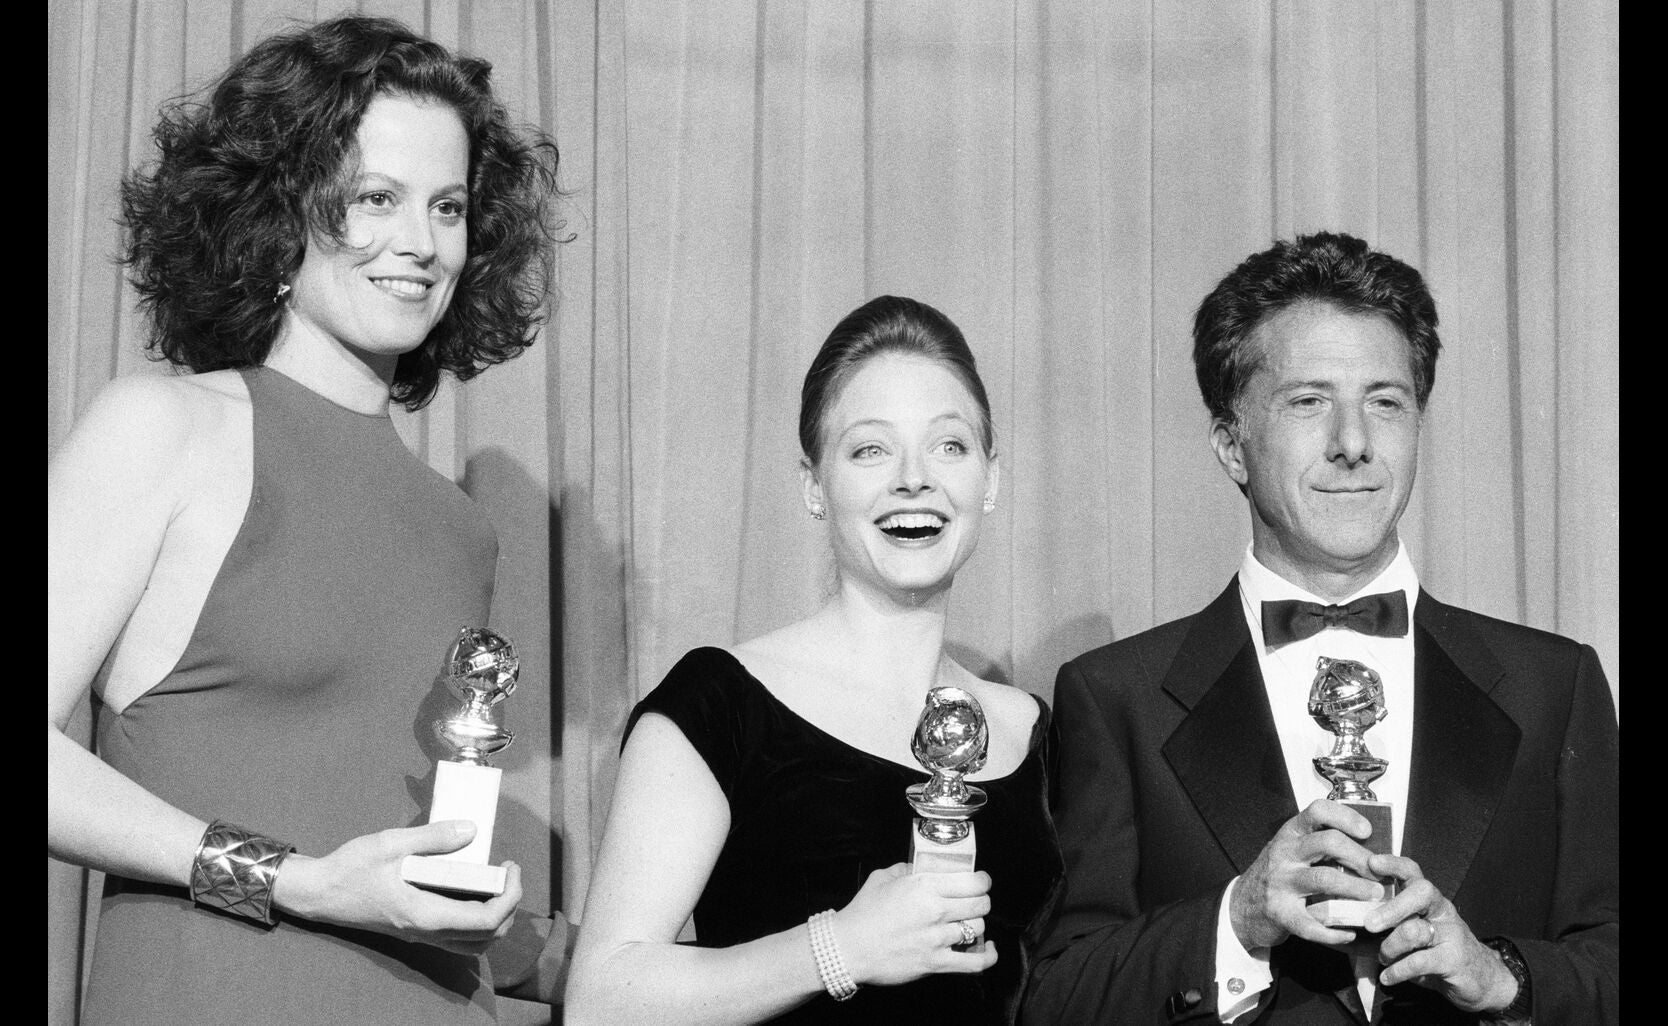 1989_gg46_sigourney_weaver_jodie_foster_dustin_hoffman_best_actress_actor_drama-gorillas_in_the_mist_accused_rain_man_ng.jpg